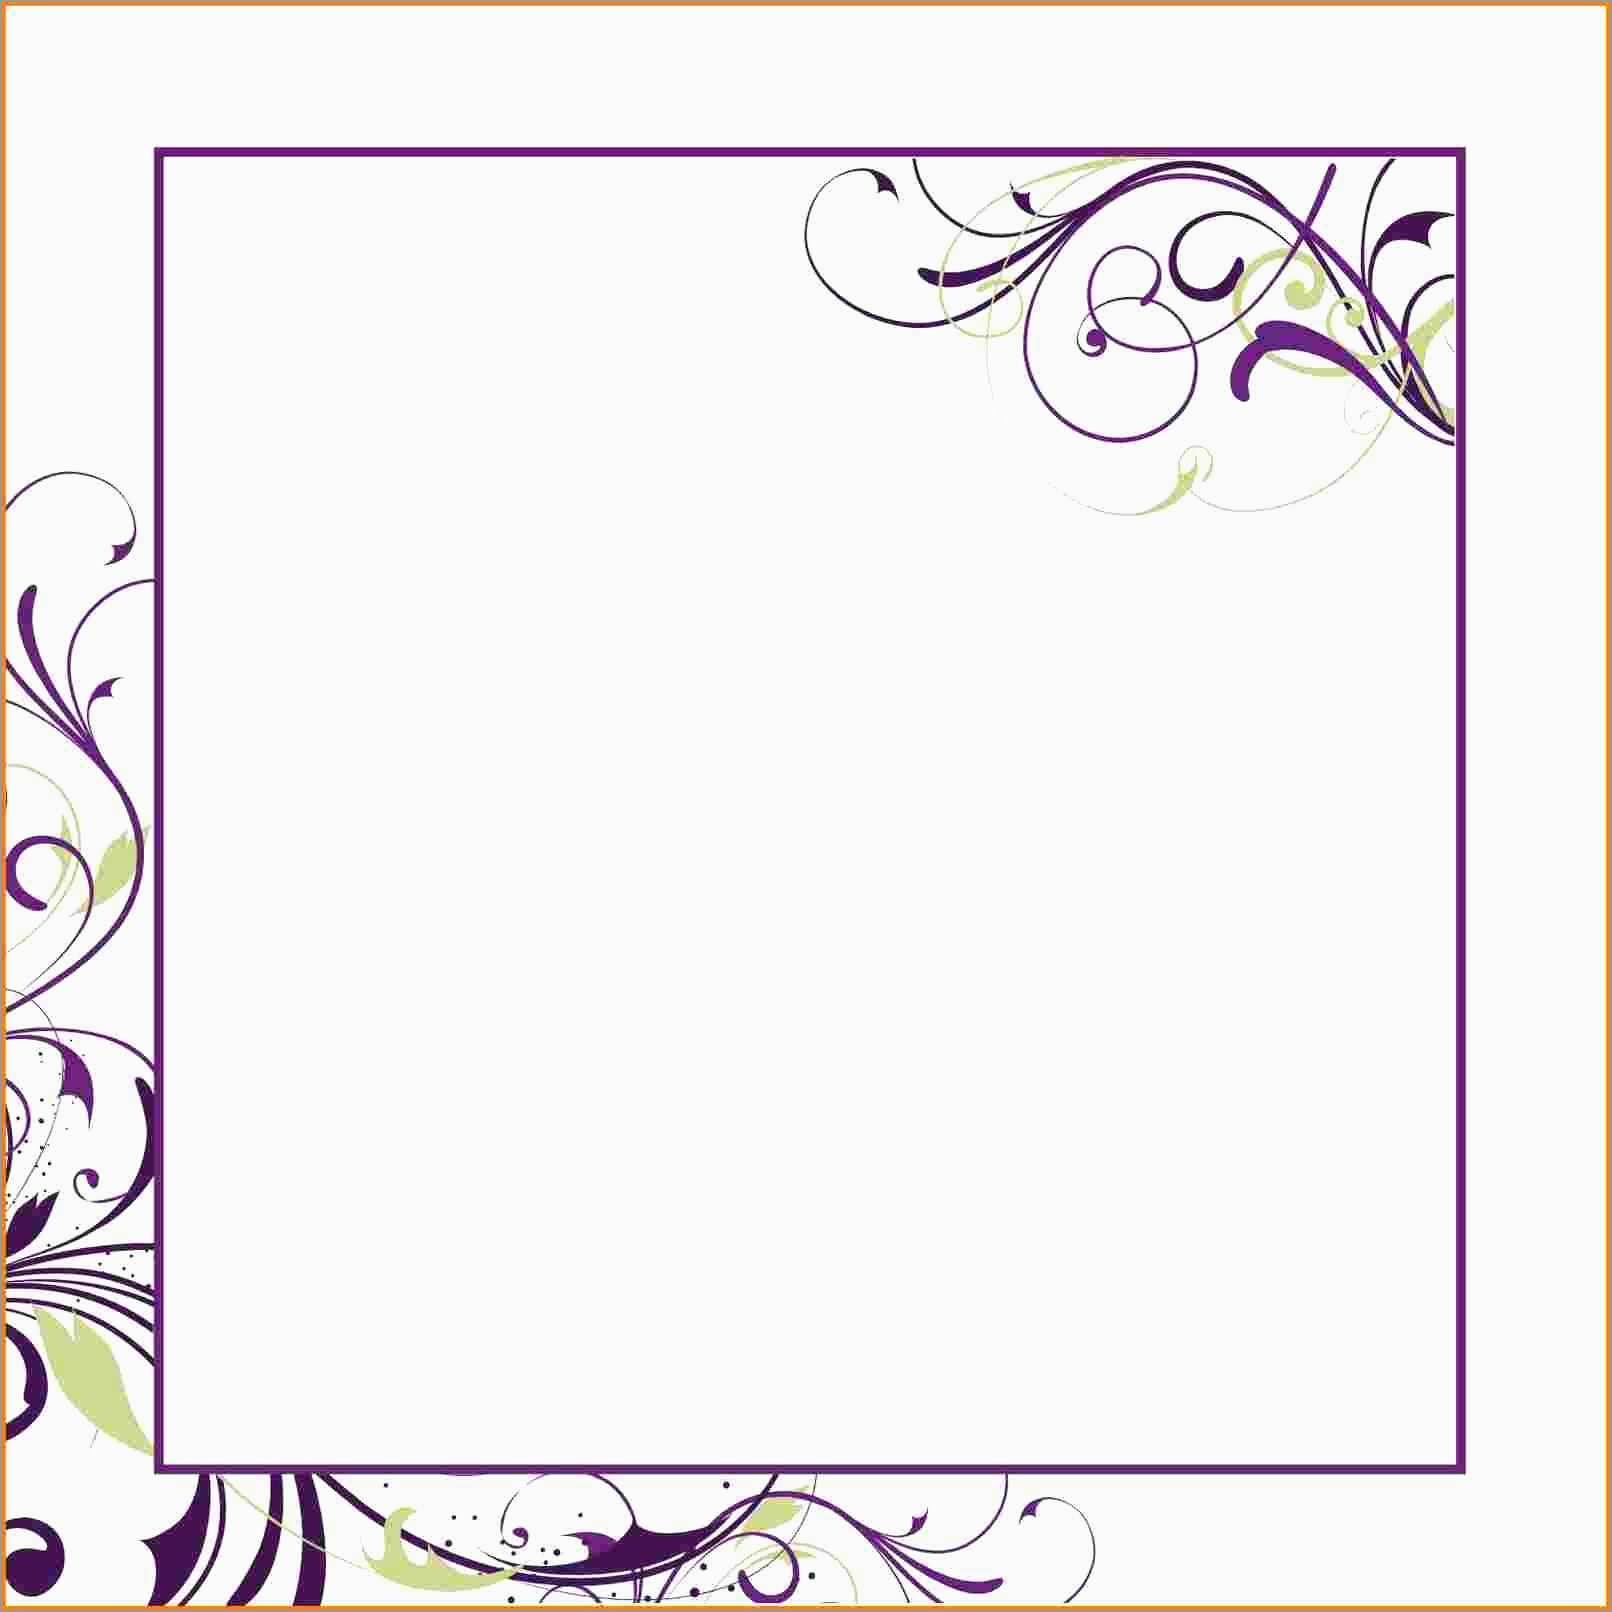 40Th Birthday Invitation Templates Free Printable Pretty Blank - Free Printable Invitation Maker